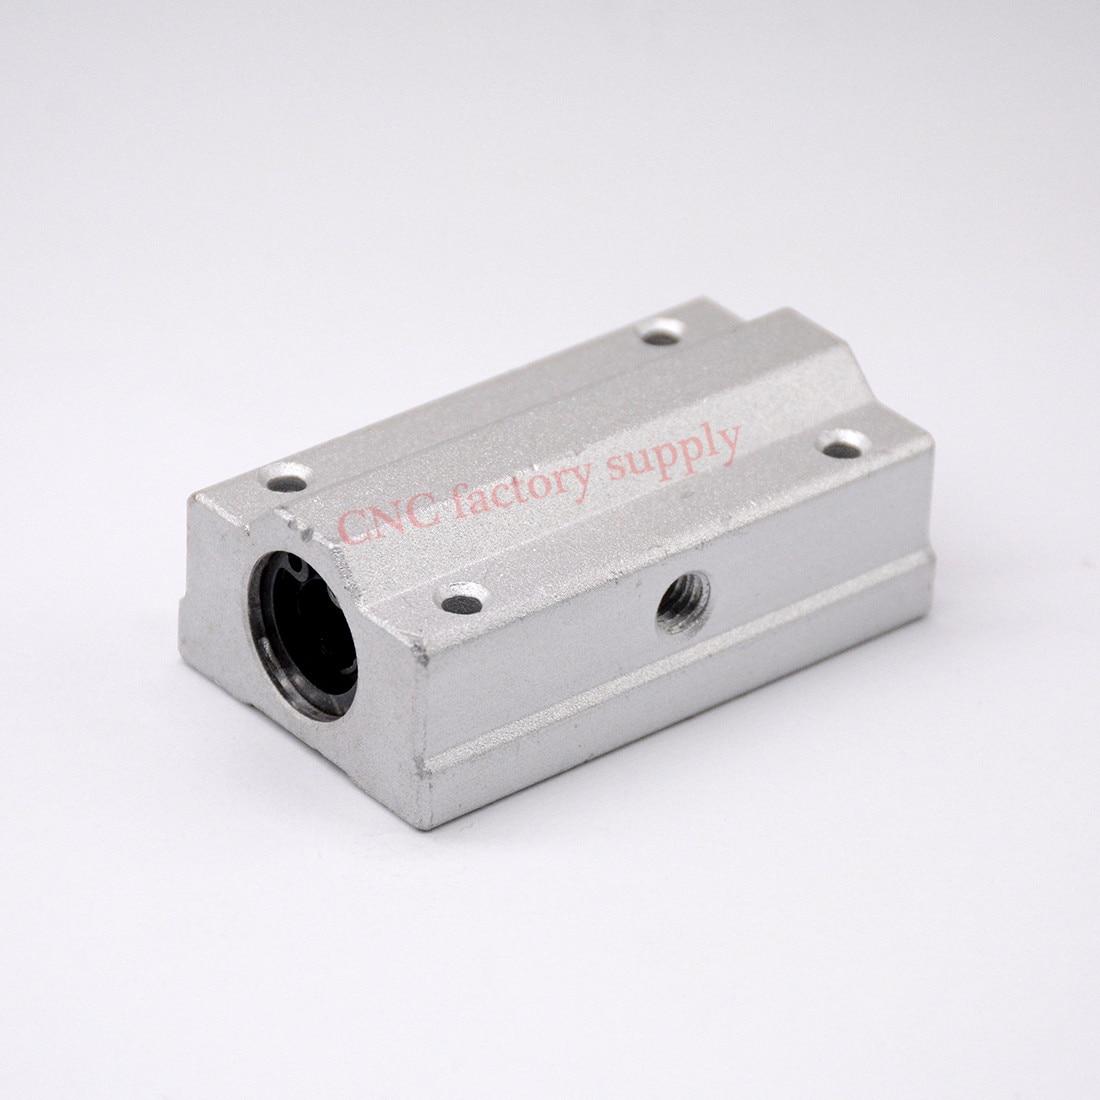 Hot sale 1pc  SC8LUU SCS8LUU 8mm long type Linear Ball Bearing Block CNC Router hot sale prdl18 7dn lengthen type